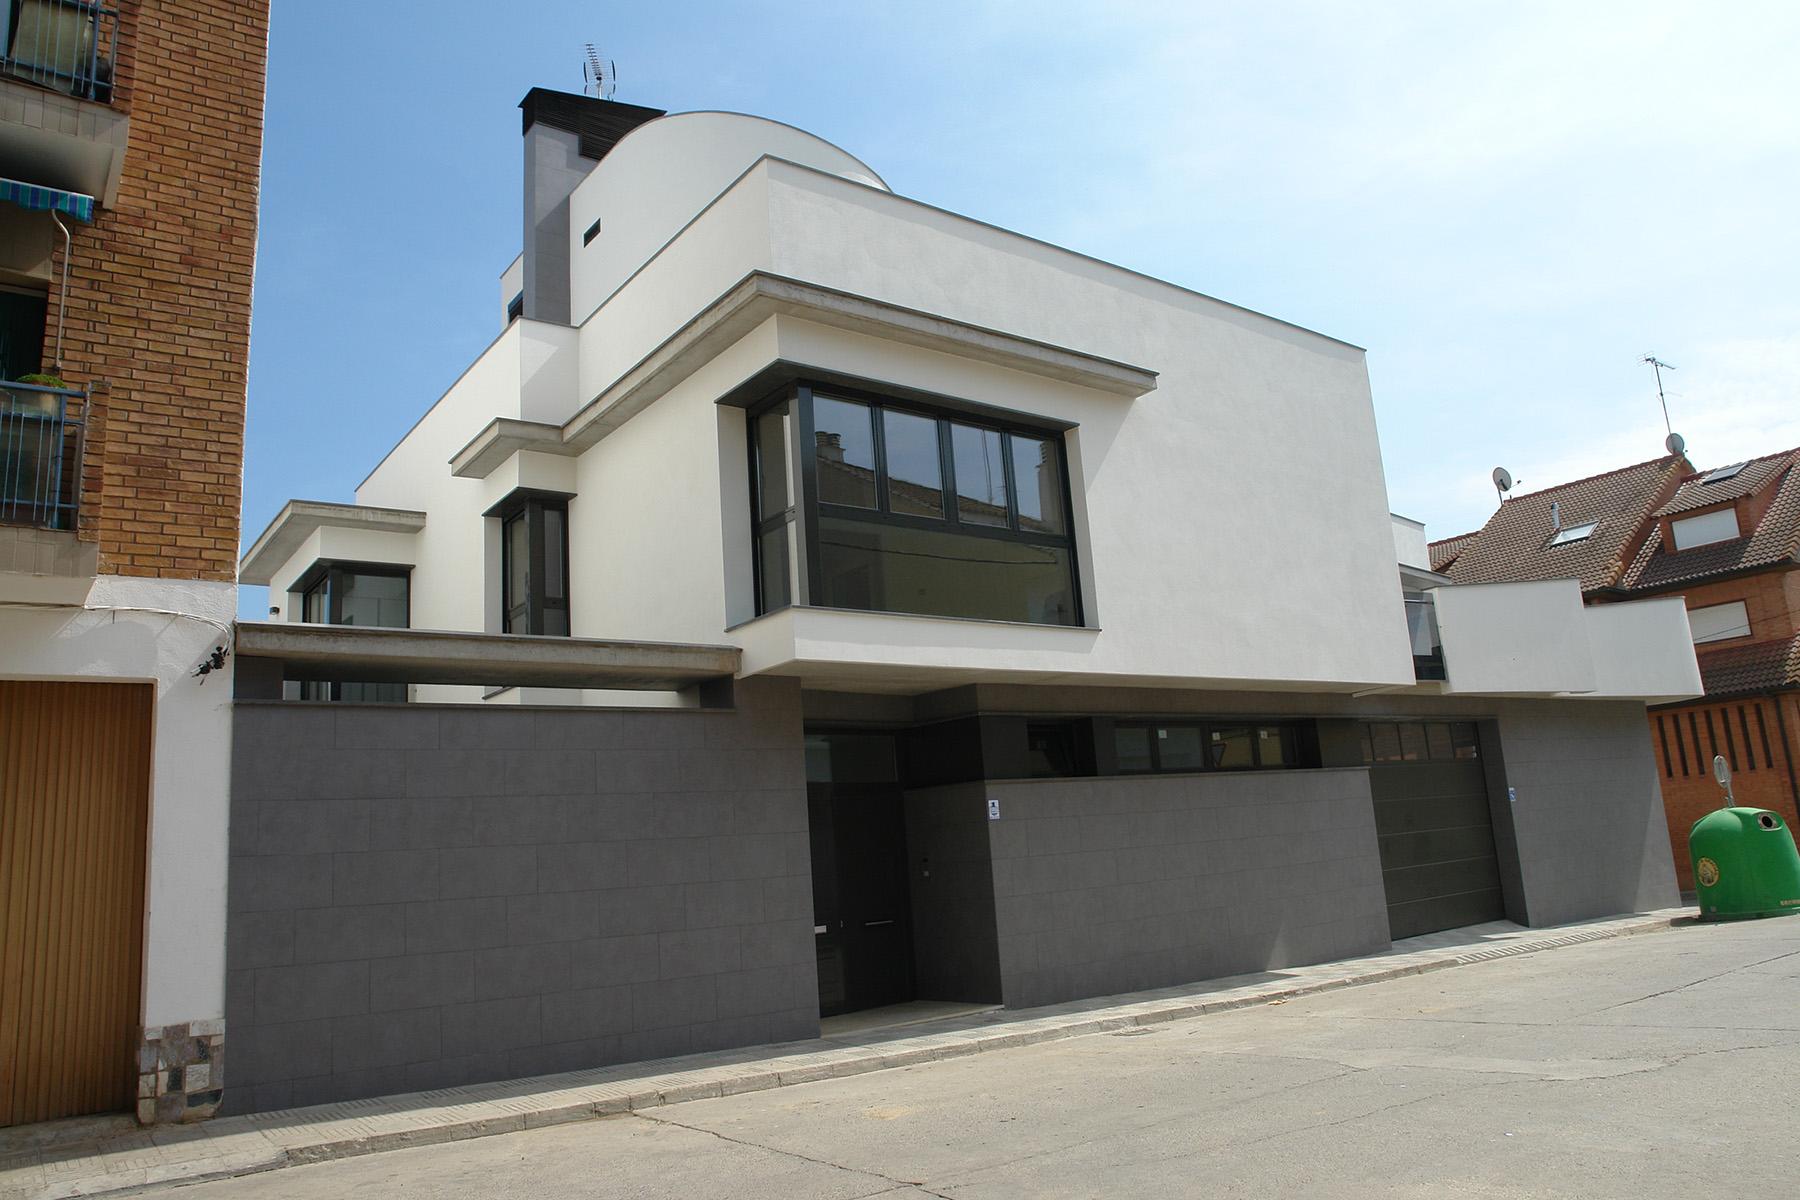 Galeria Casa en Binéfar, Huesca - 8 ?>